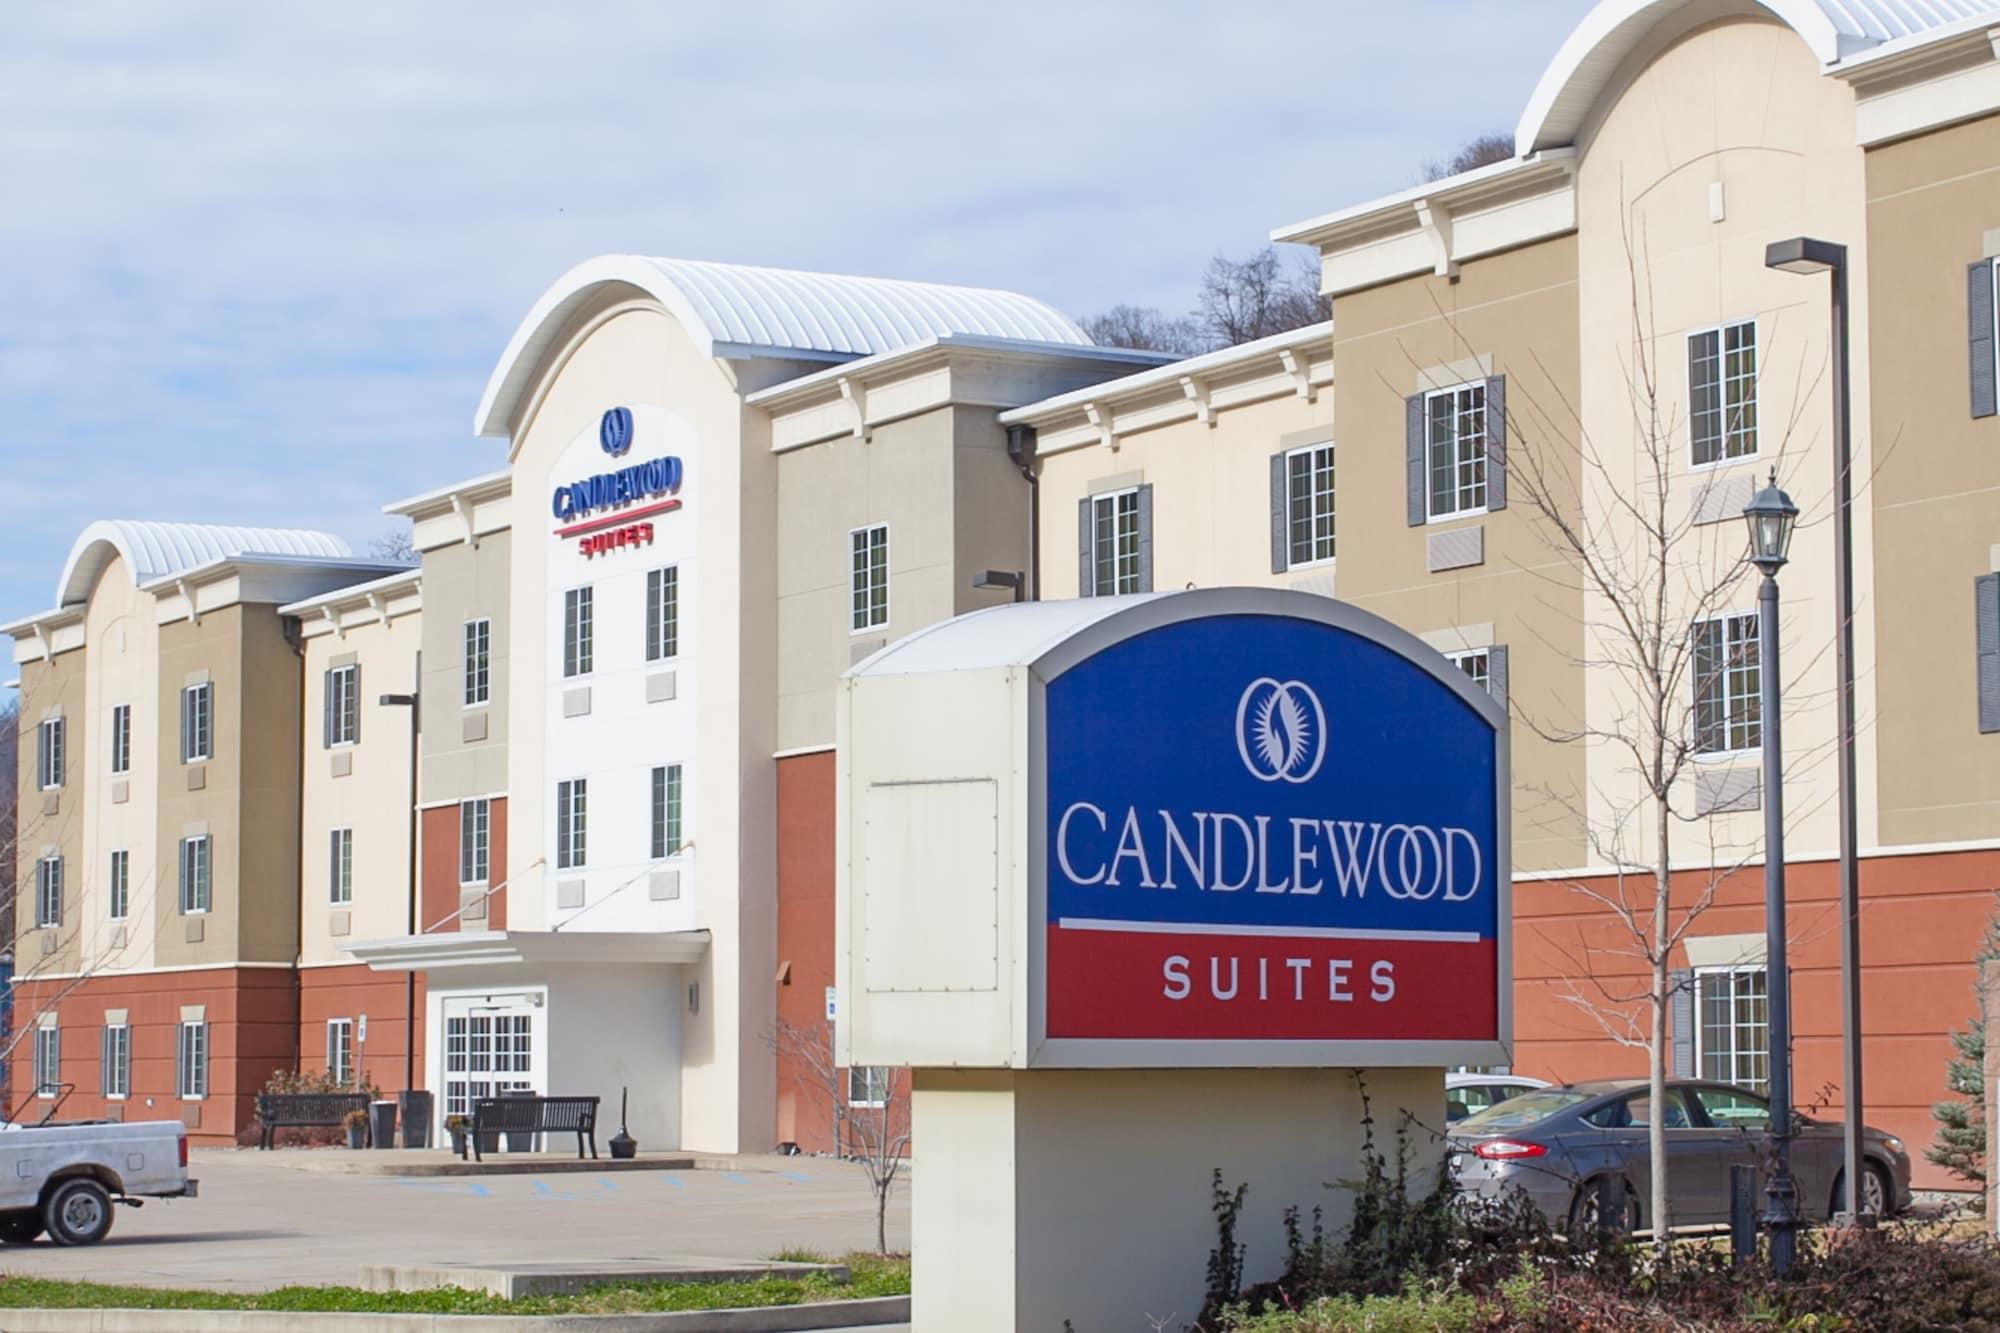 Candlewood Suites Logan, Logan